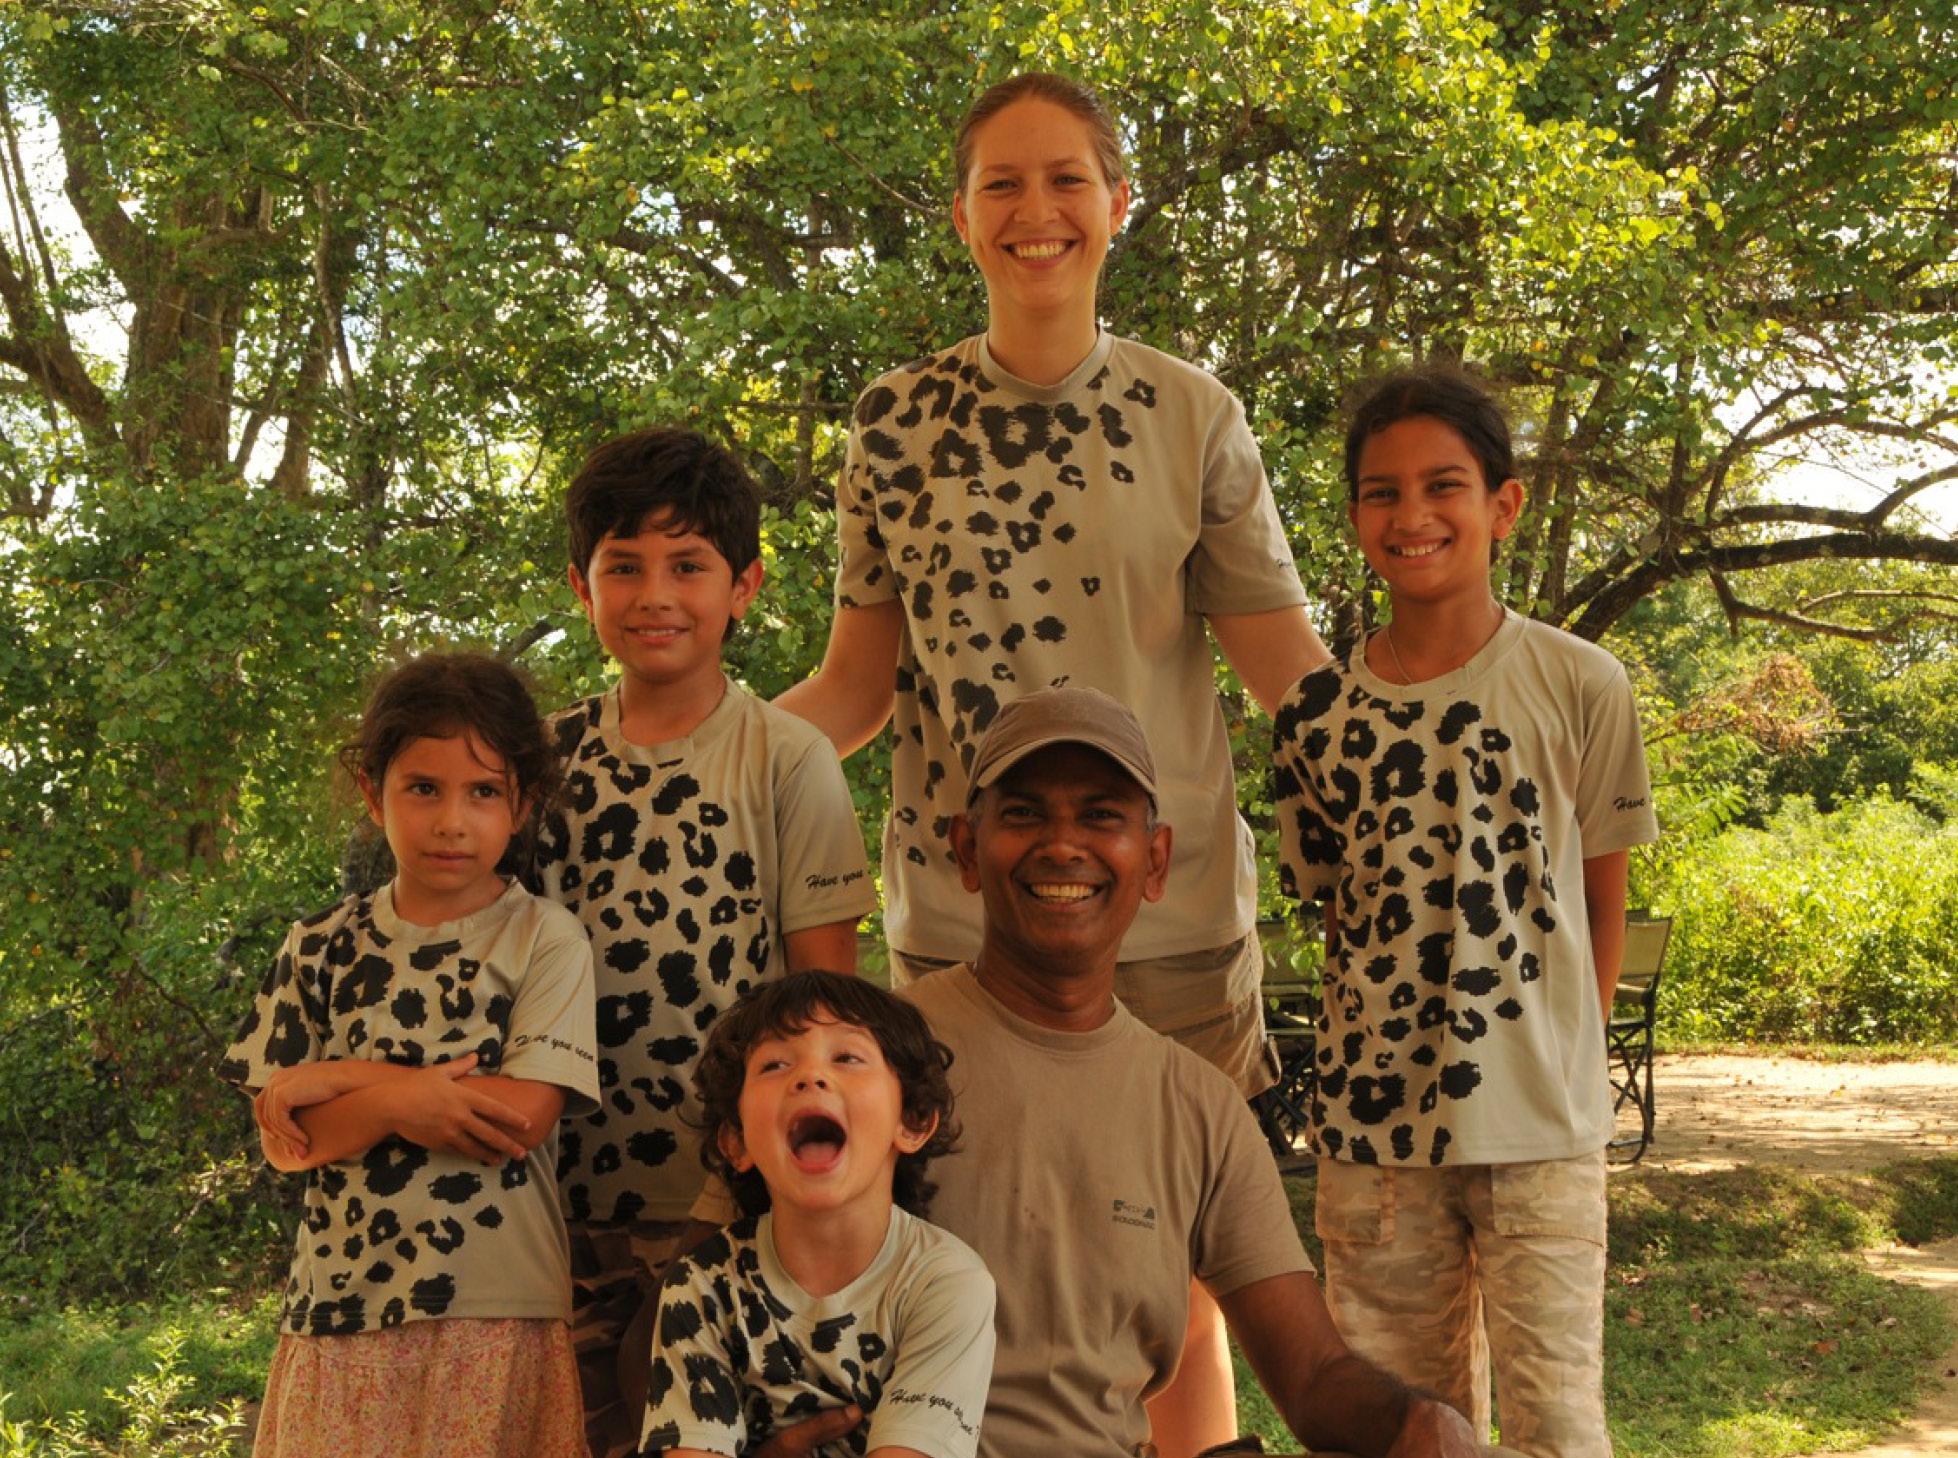 noel-rodrigo-leopard-safari-yala-national-park-sri-lanka-kids